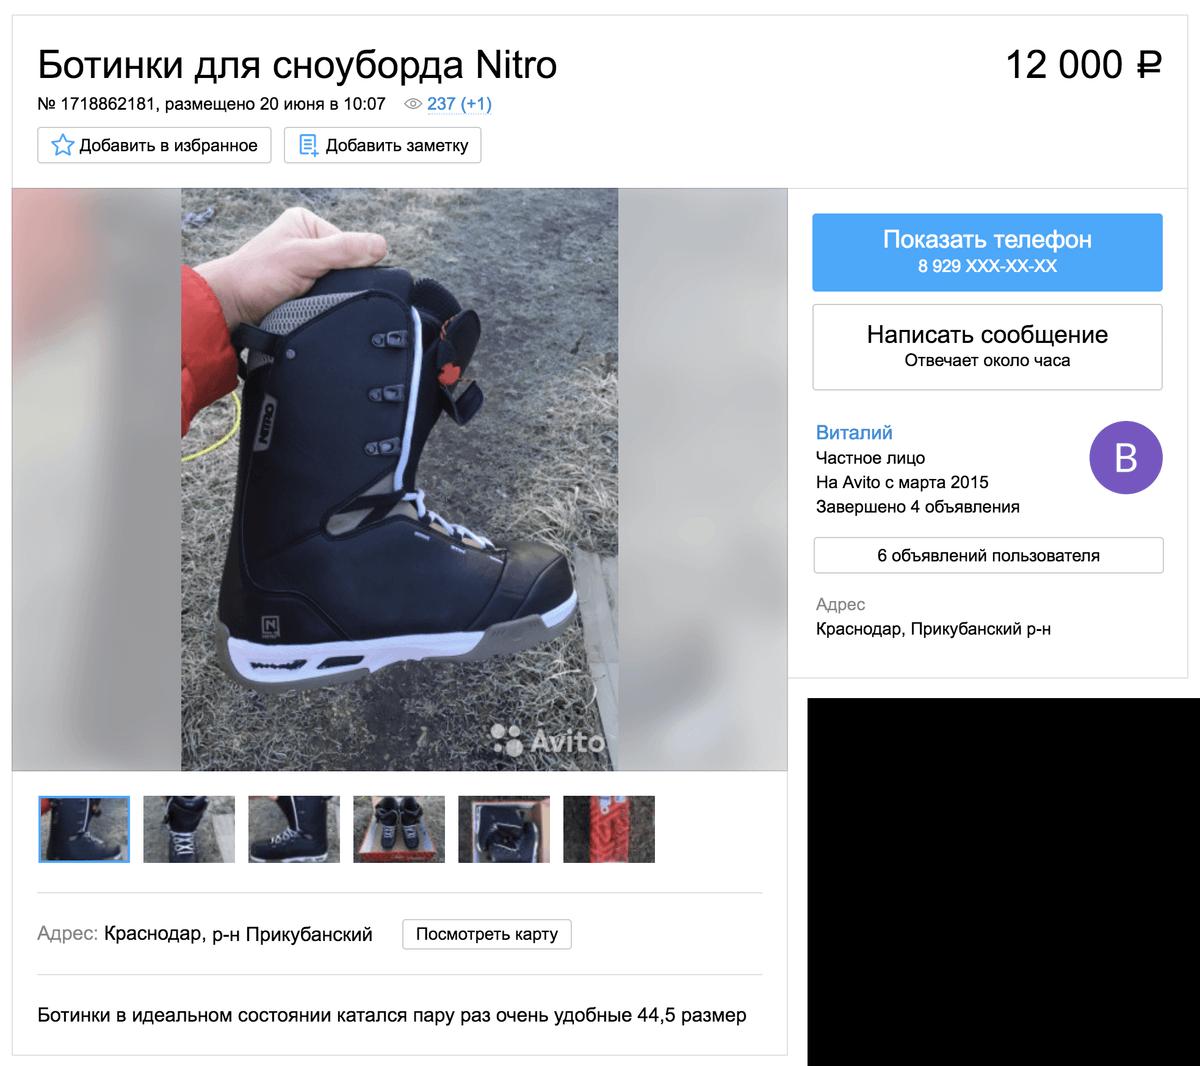 Подержанные ботинки для сноуборда за 12 000<span class=ruble>Р</span>. Источник: Авито